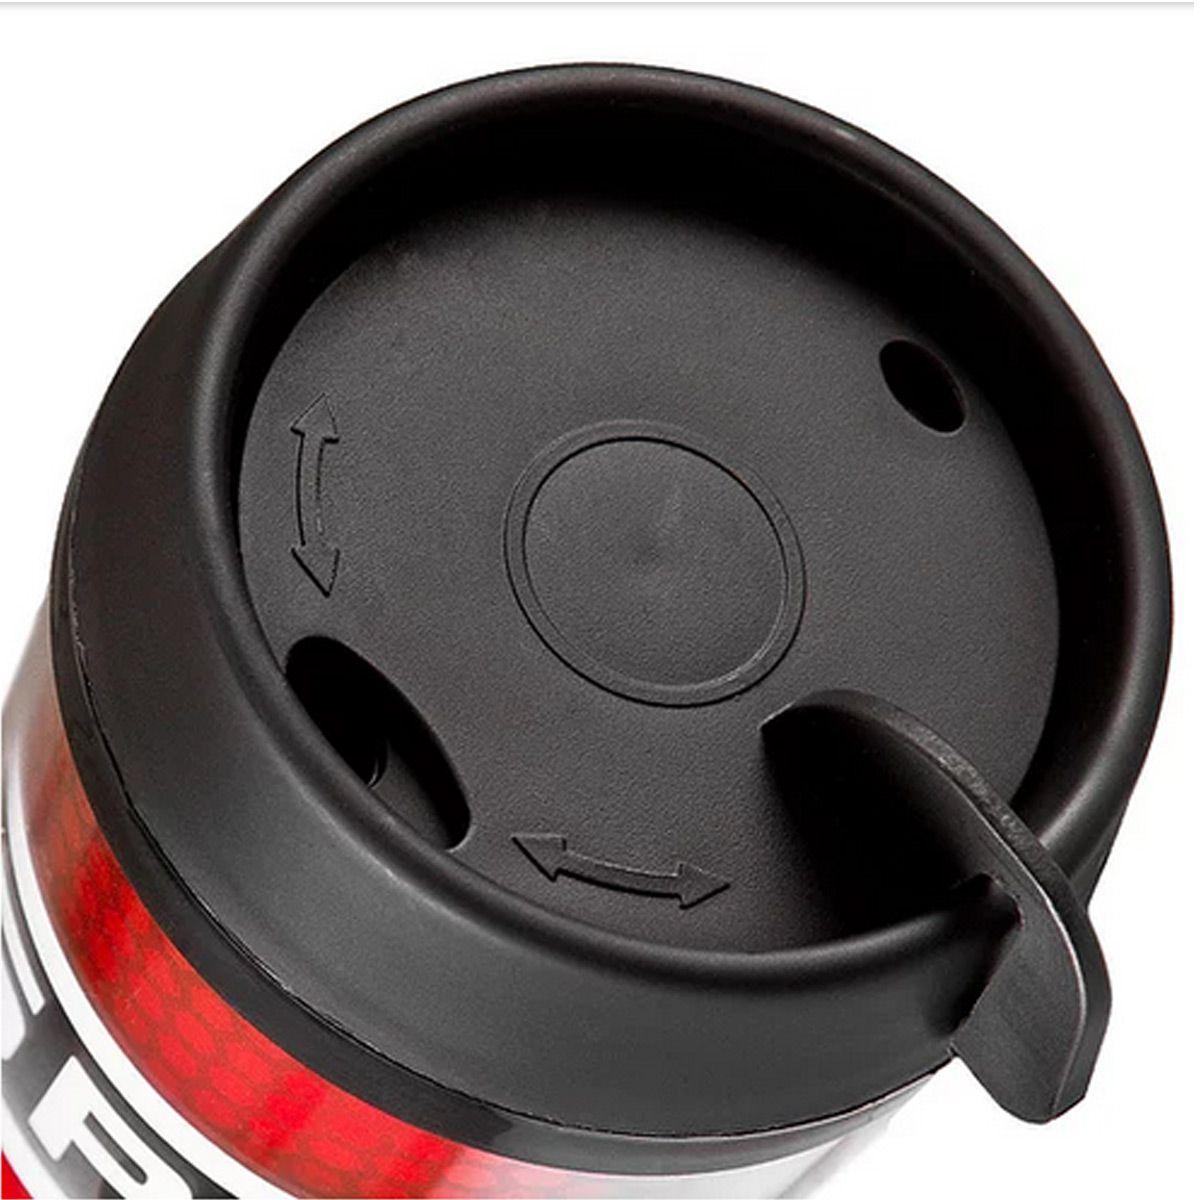 Copo Térmico do São Paulo 500 ml Pro Tork